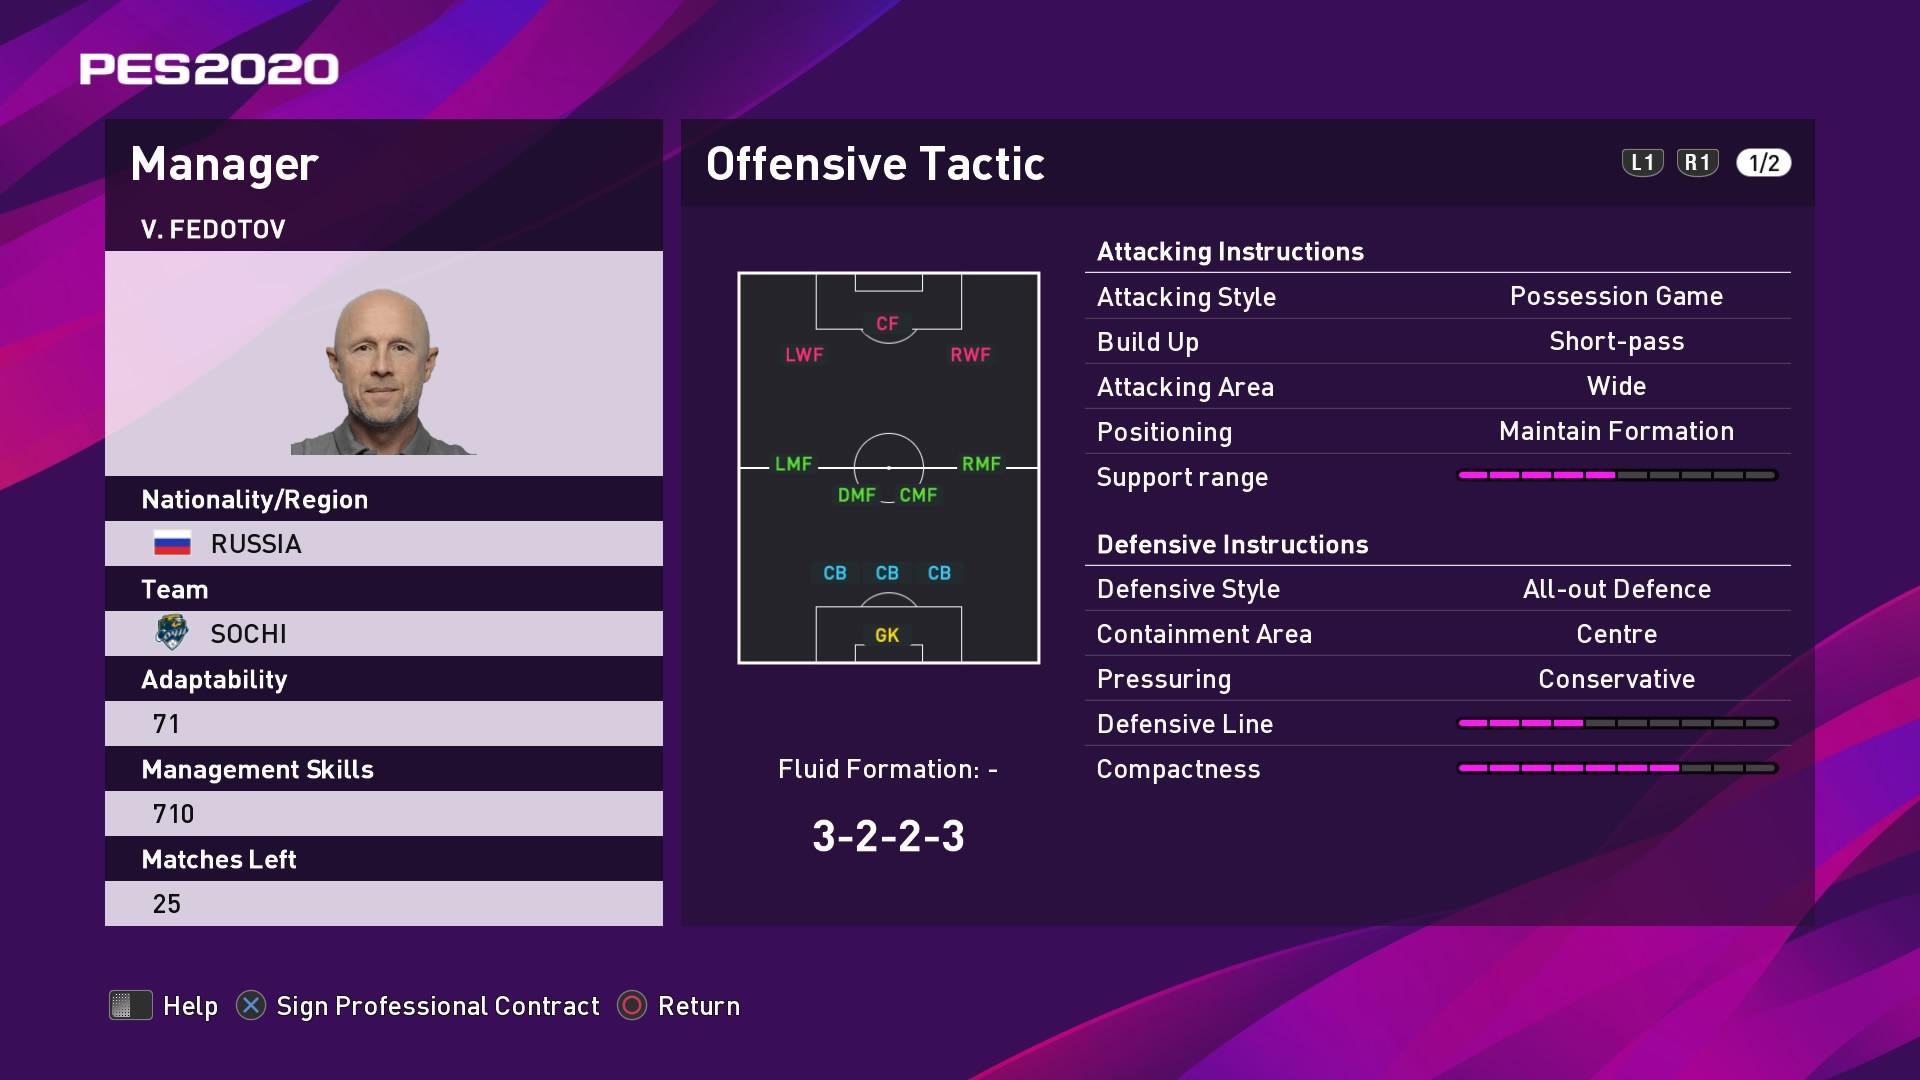 V. Fedotov (Vladimir Fedotov) Offensive Tactic in PES 2020 myClub